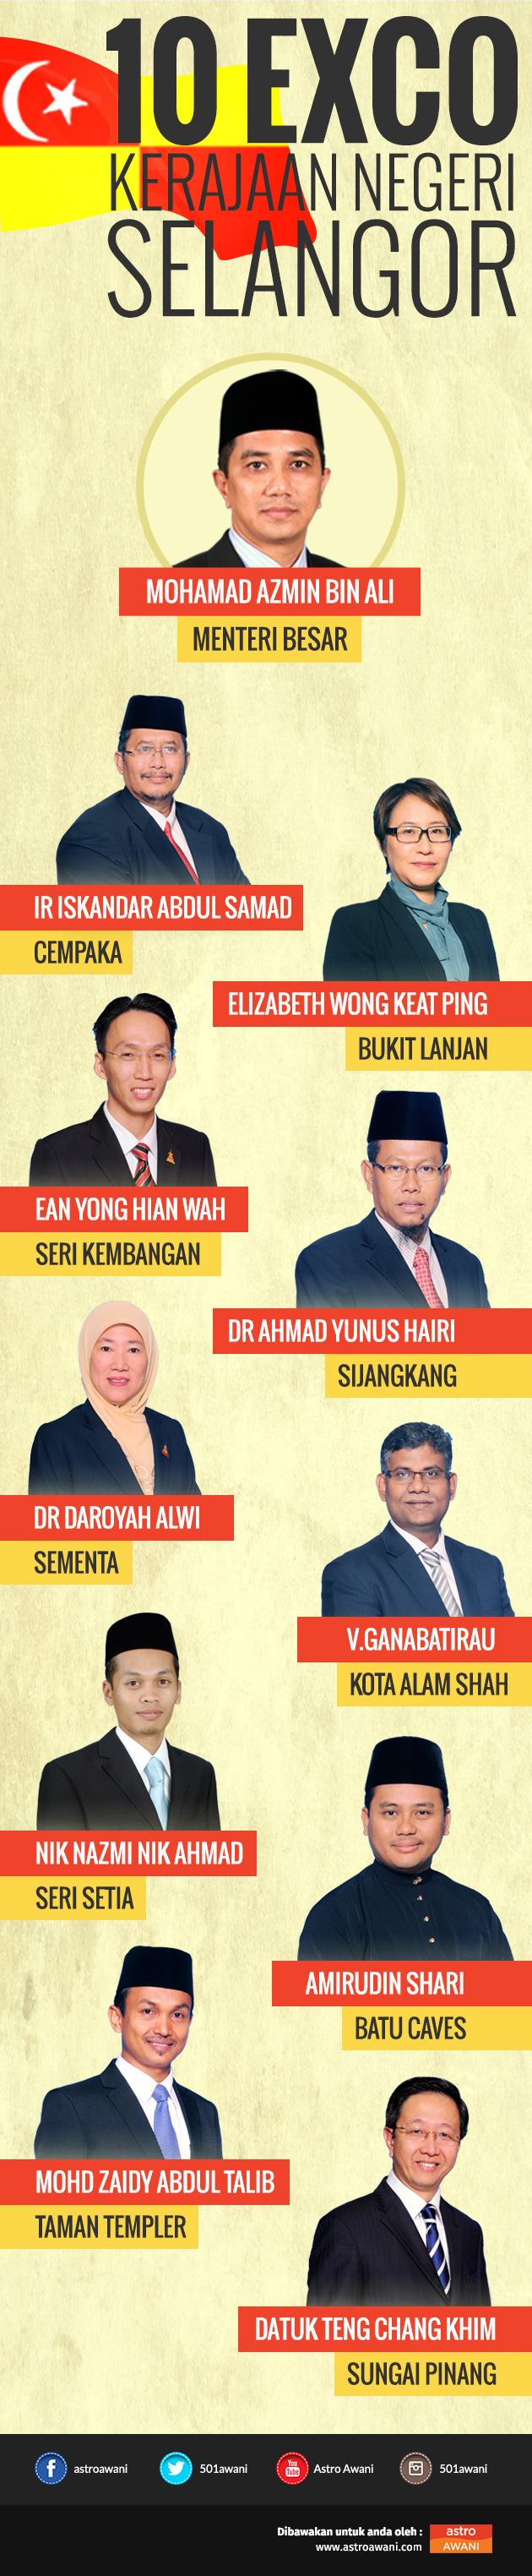 Infografik Exco Selangor